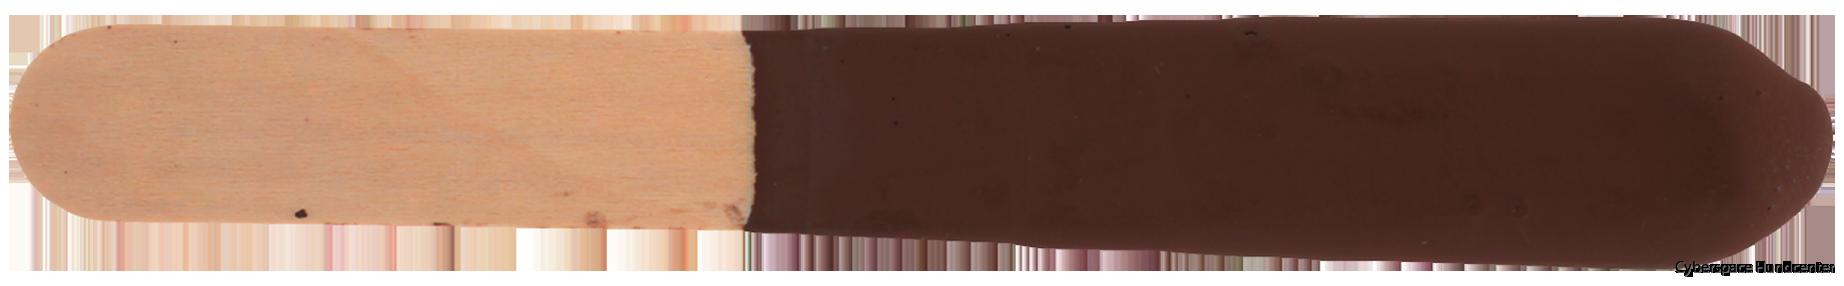 027-Brown-ChrisStix_FullRes